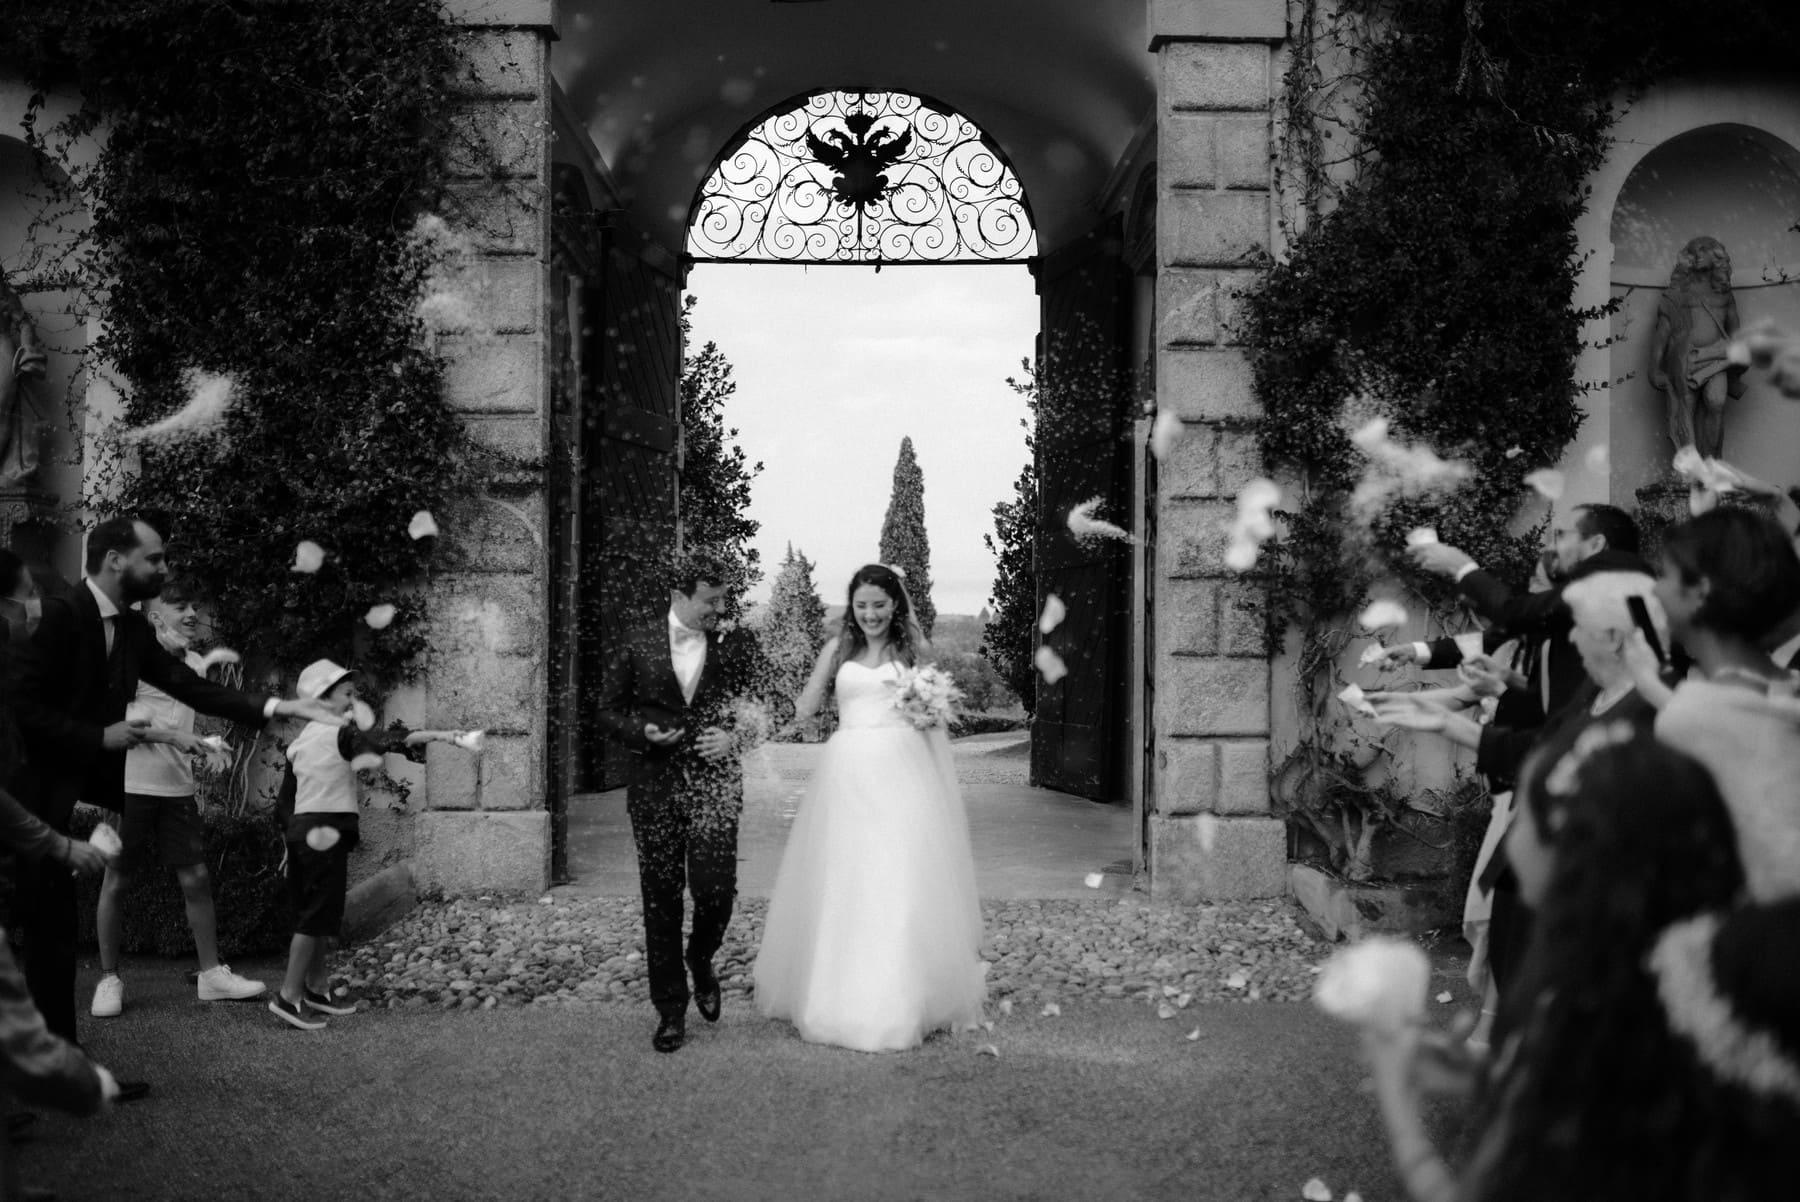 End of wedding ceremony at Villa Orsini Colonna